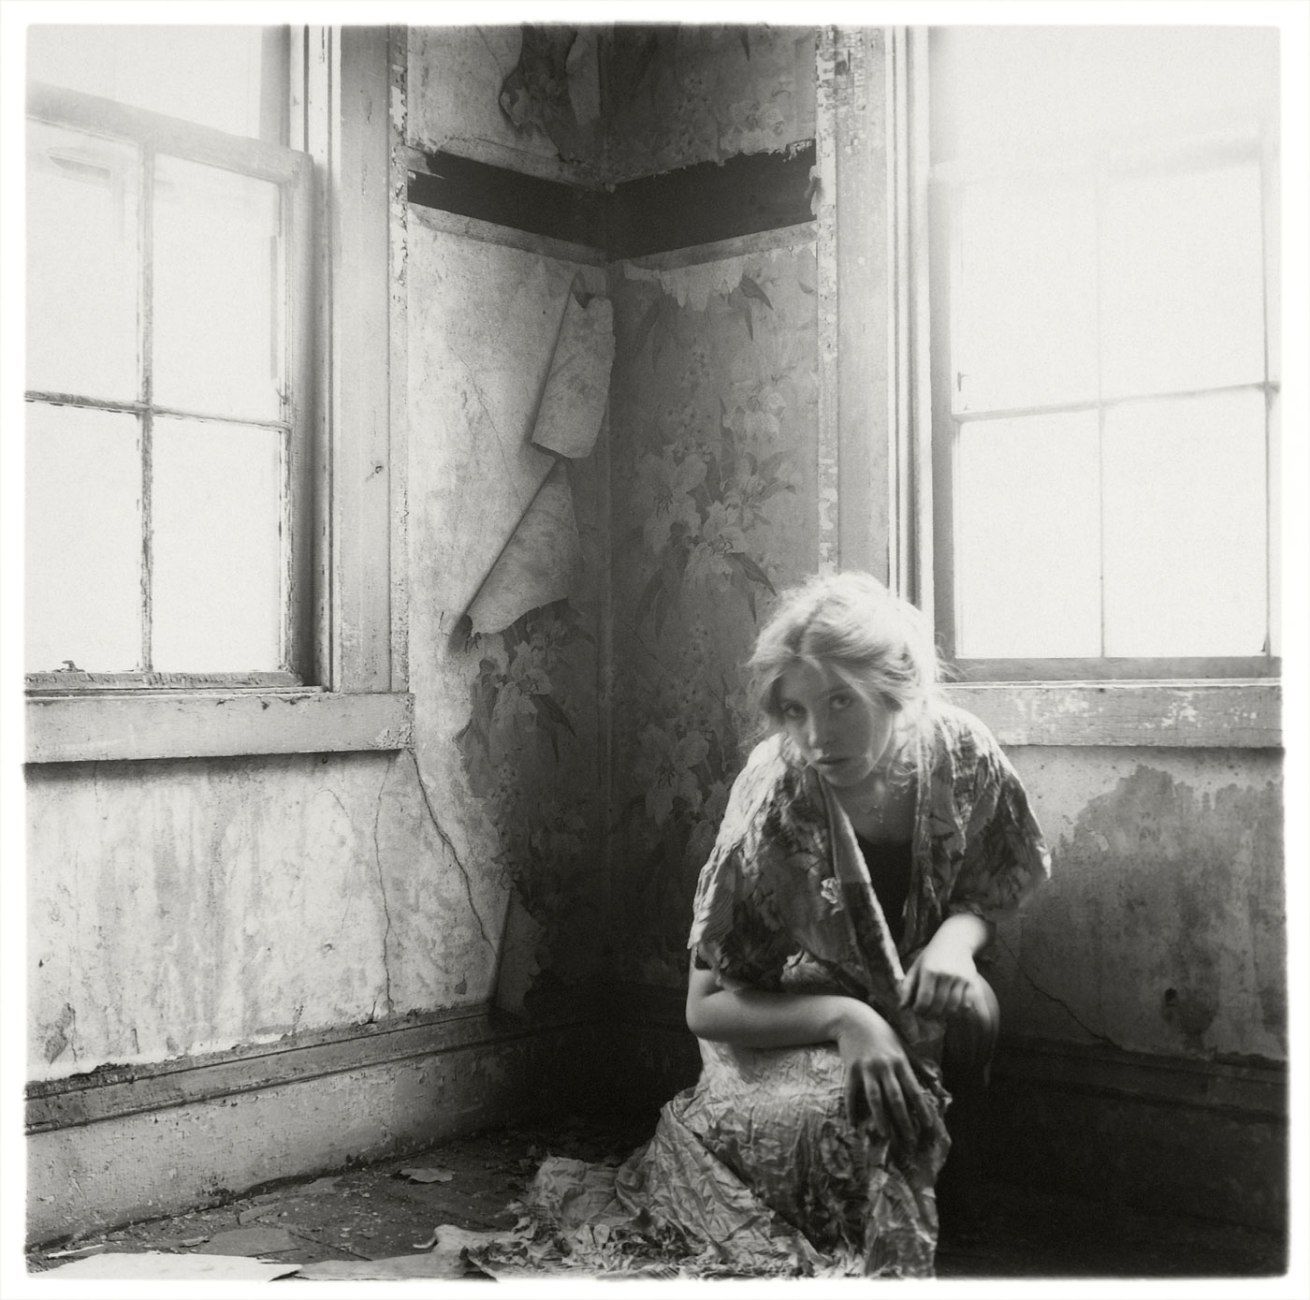 Fotó: Francesca Woodman<br />Untitled, Providence, Rhode Island, 1975-78<br />© George and Betty Woodman